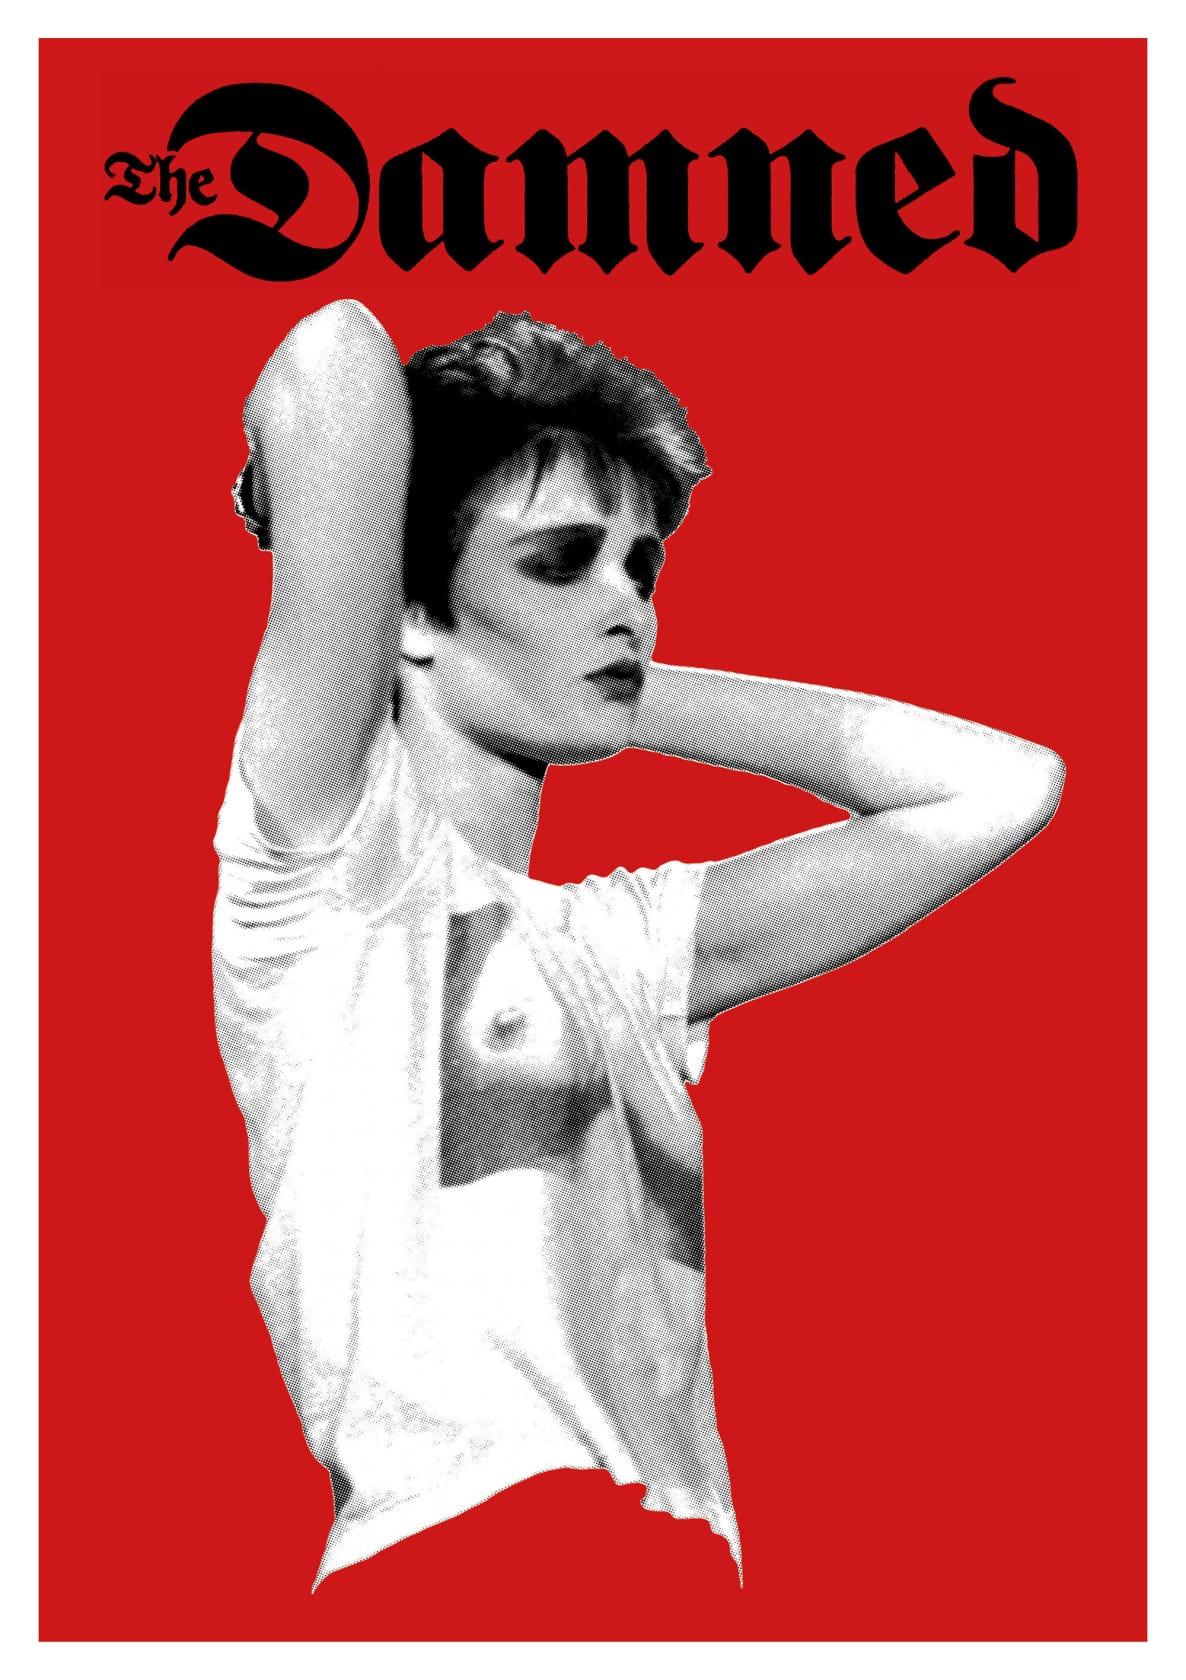 KEVIN CUMMINS & SCOTT KING Bootleg 3 colour screenprint on A1 G.F Smith Colorplan Bright White